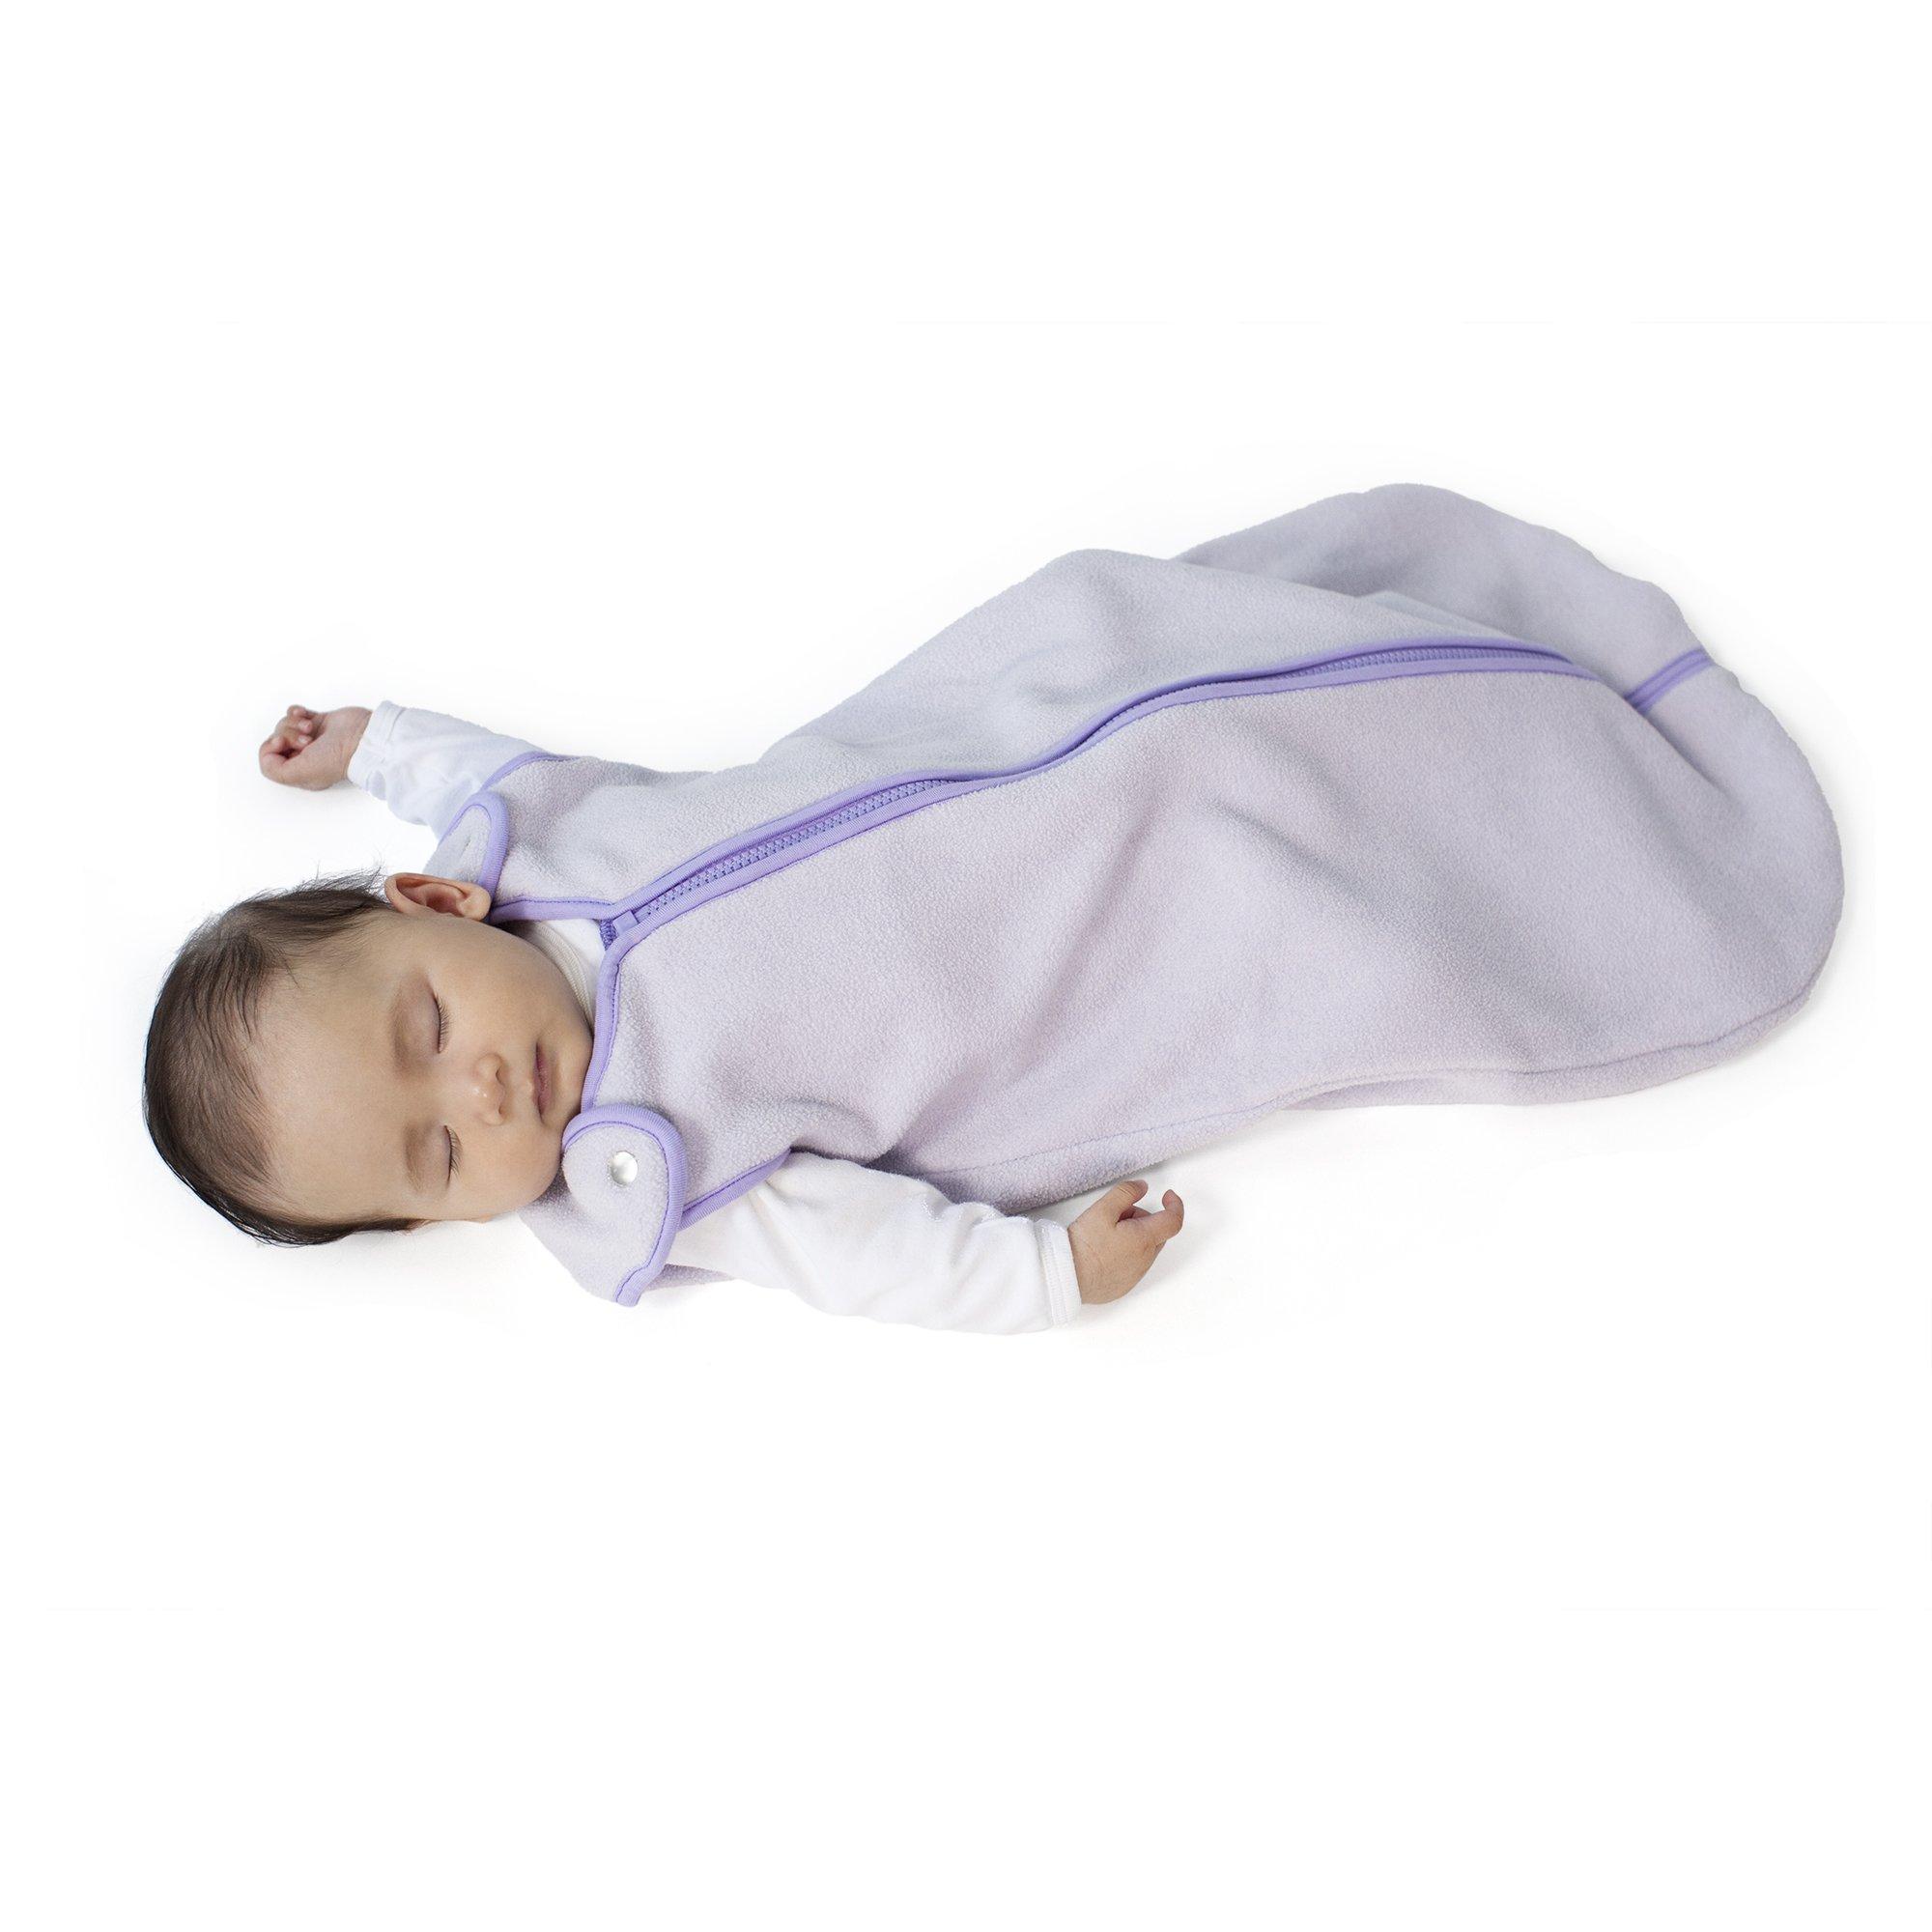 Sleep nest Fleece Baby Sleeping Bag, Lavender, Large (18-36 Months)